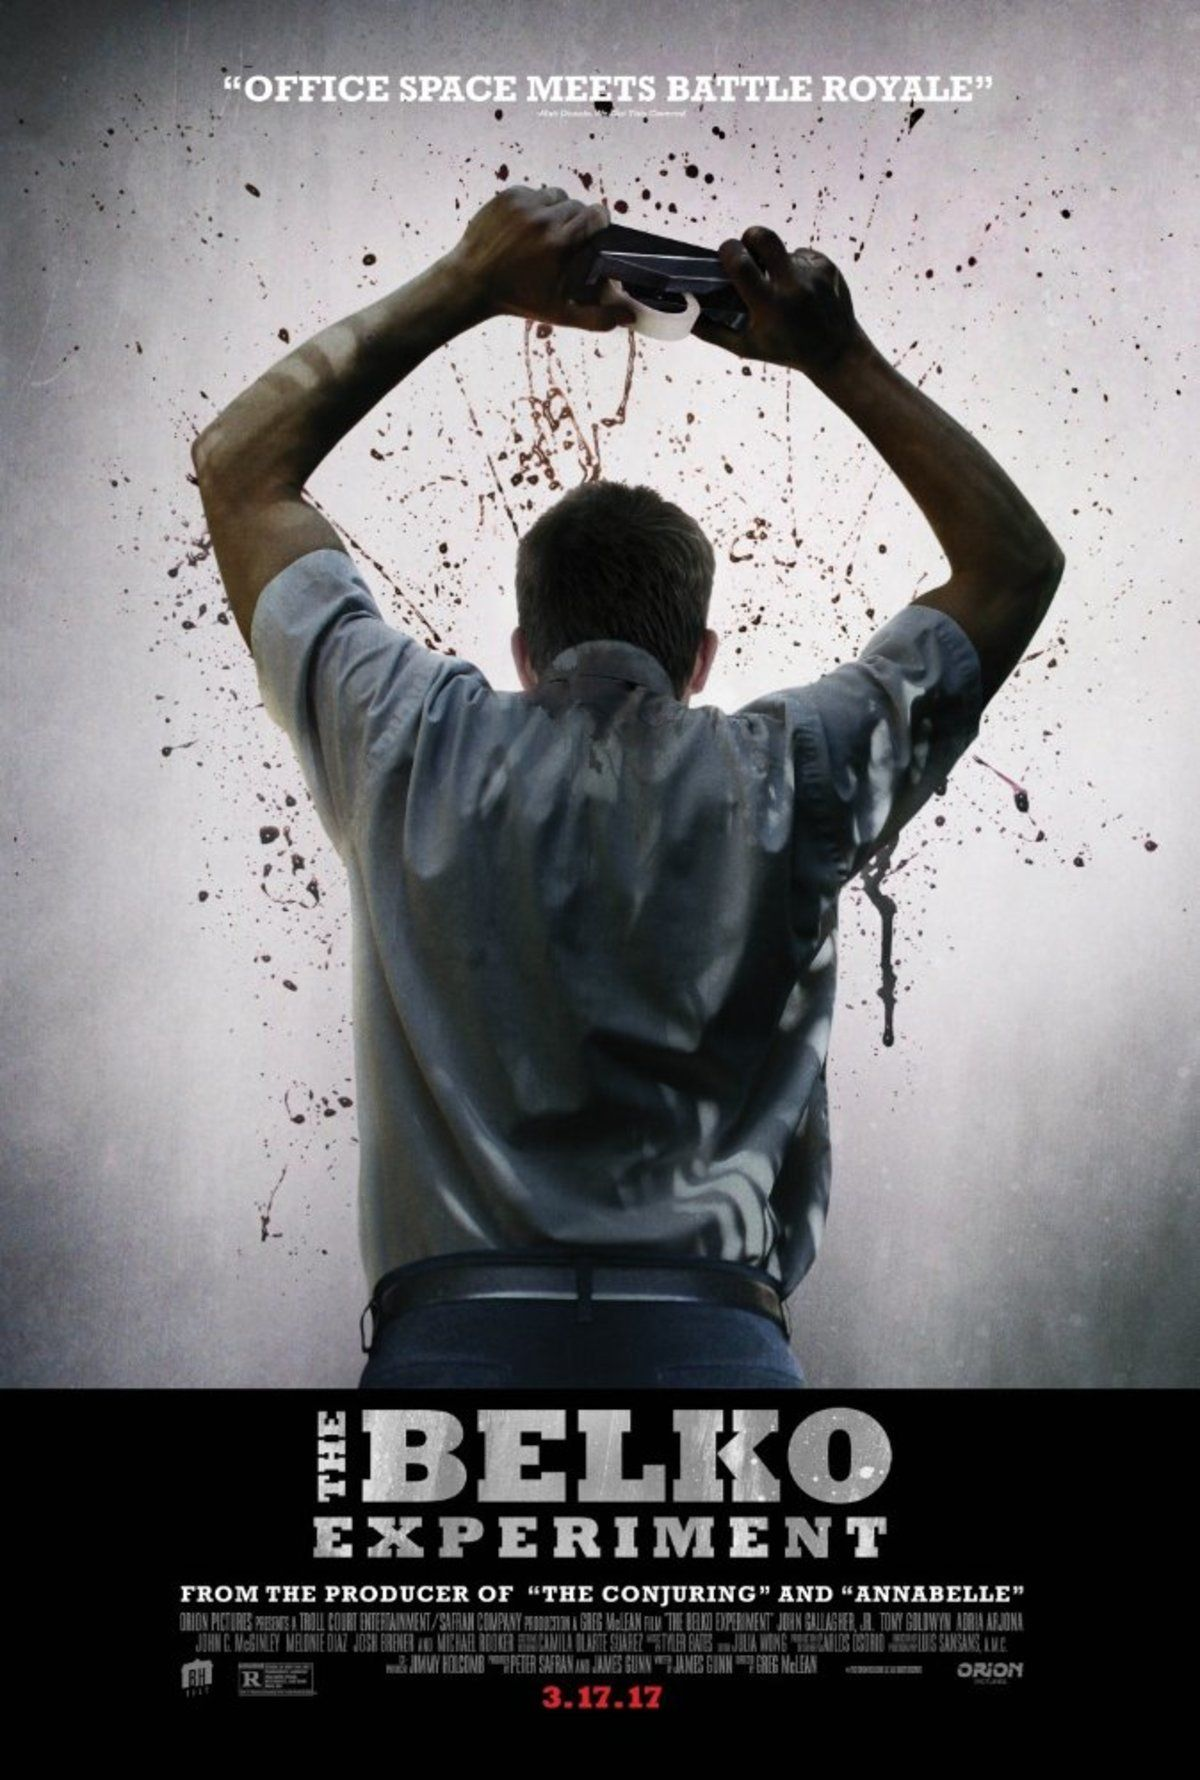 Movie Film Thebelkoexperiment Today S Throwback The Belko Experiment 2016 Movie Throwback Full Movies Online Free Free Movies Online Hd Movies Online